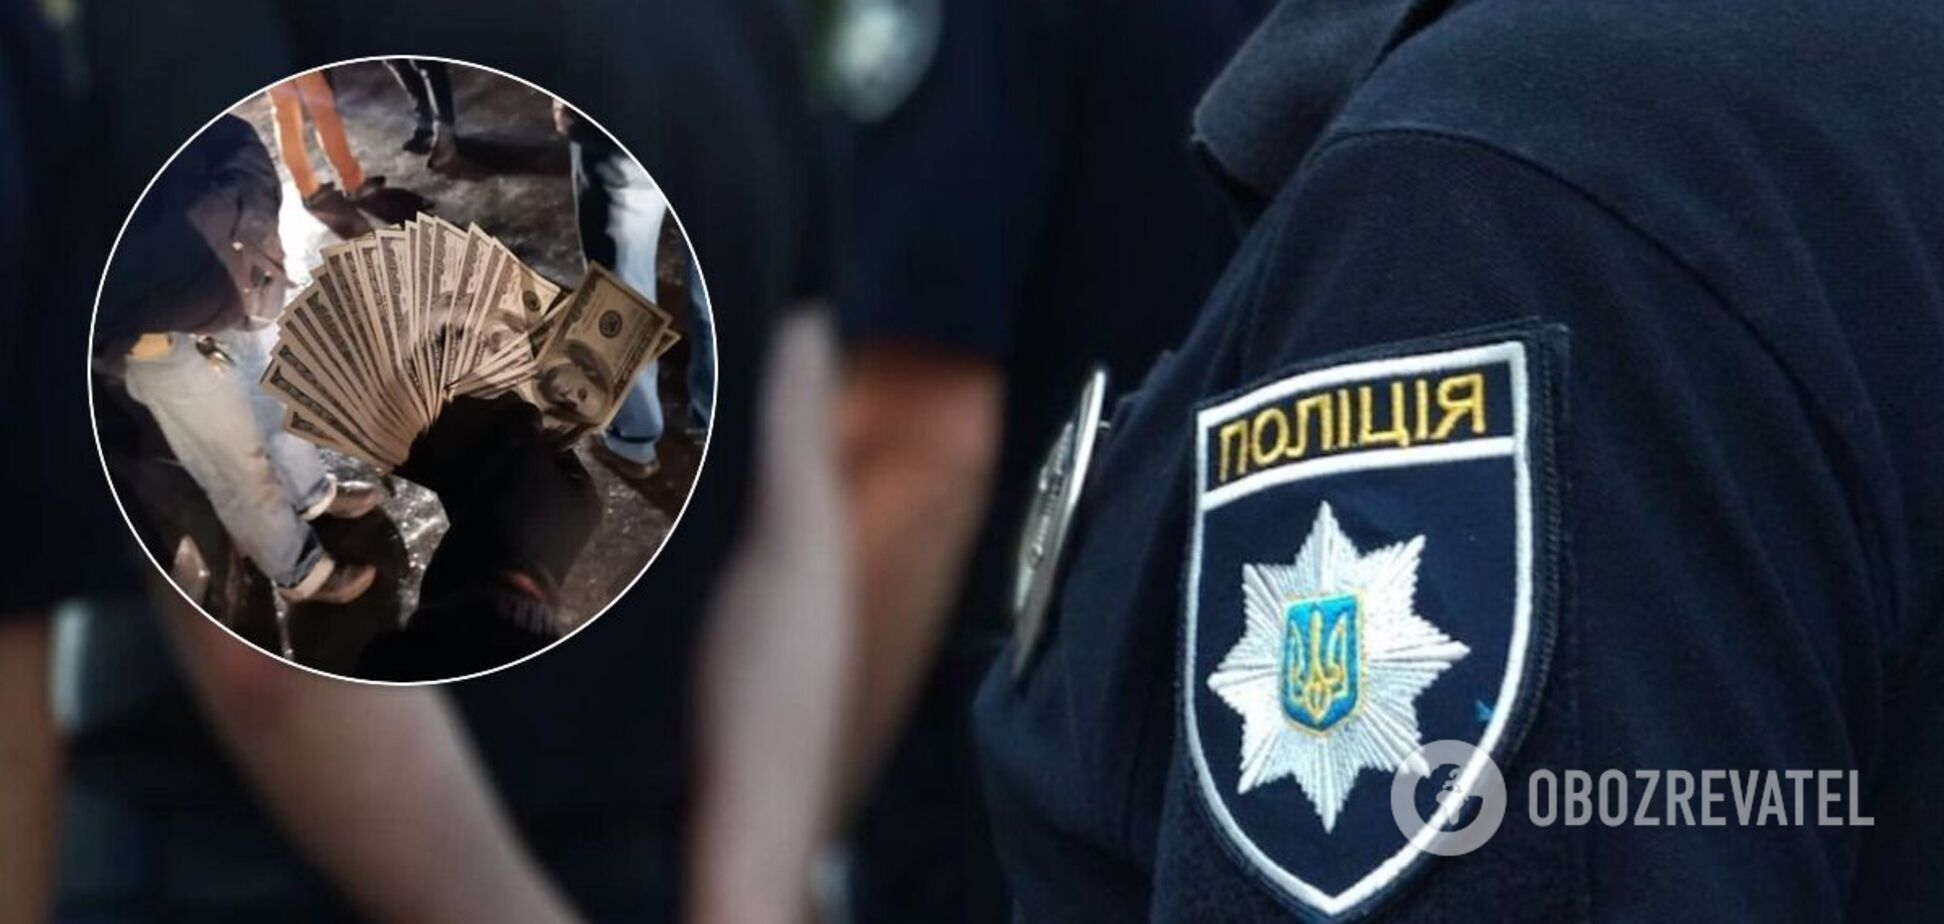 Полицейских поймали 'на горячем'